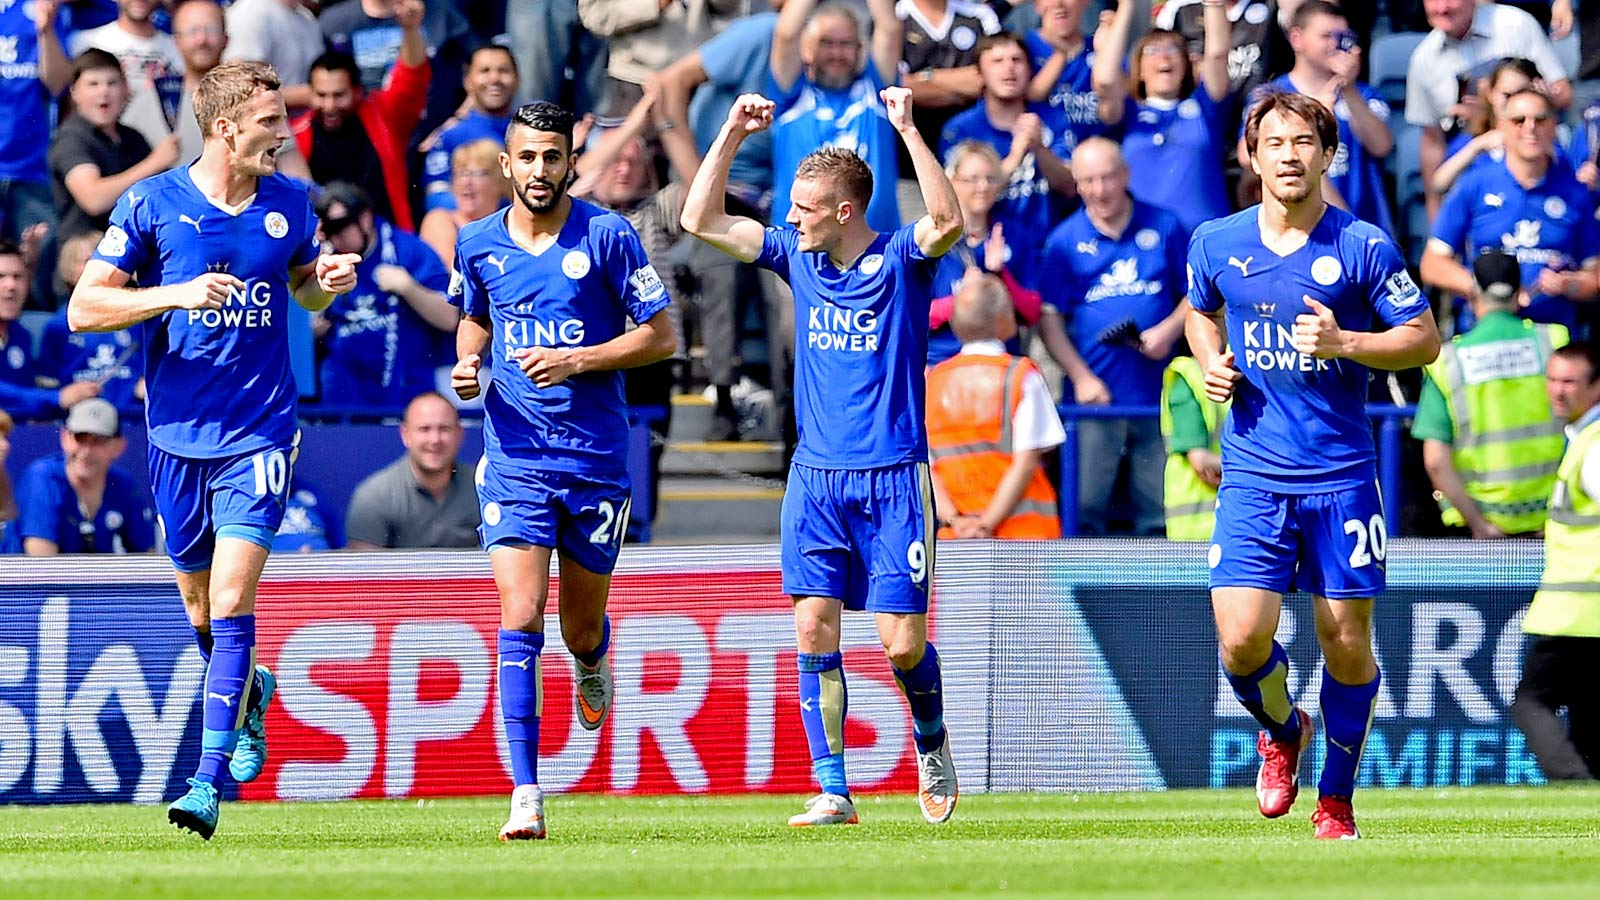 Leicester smoke Sunderland; Villa, Crystal Palace opening day winners